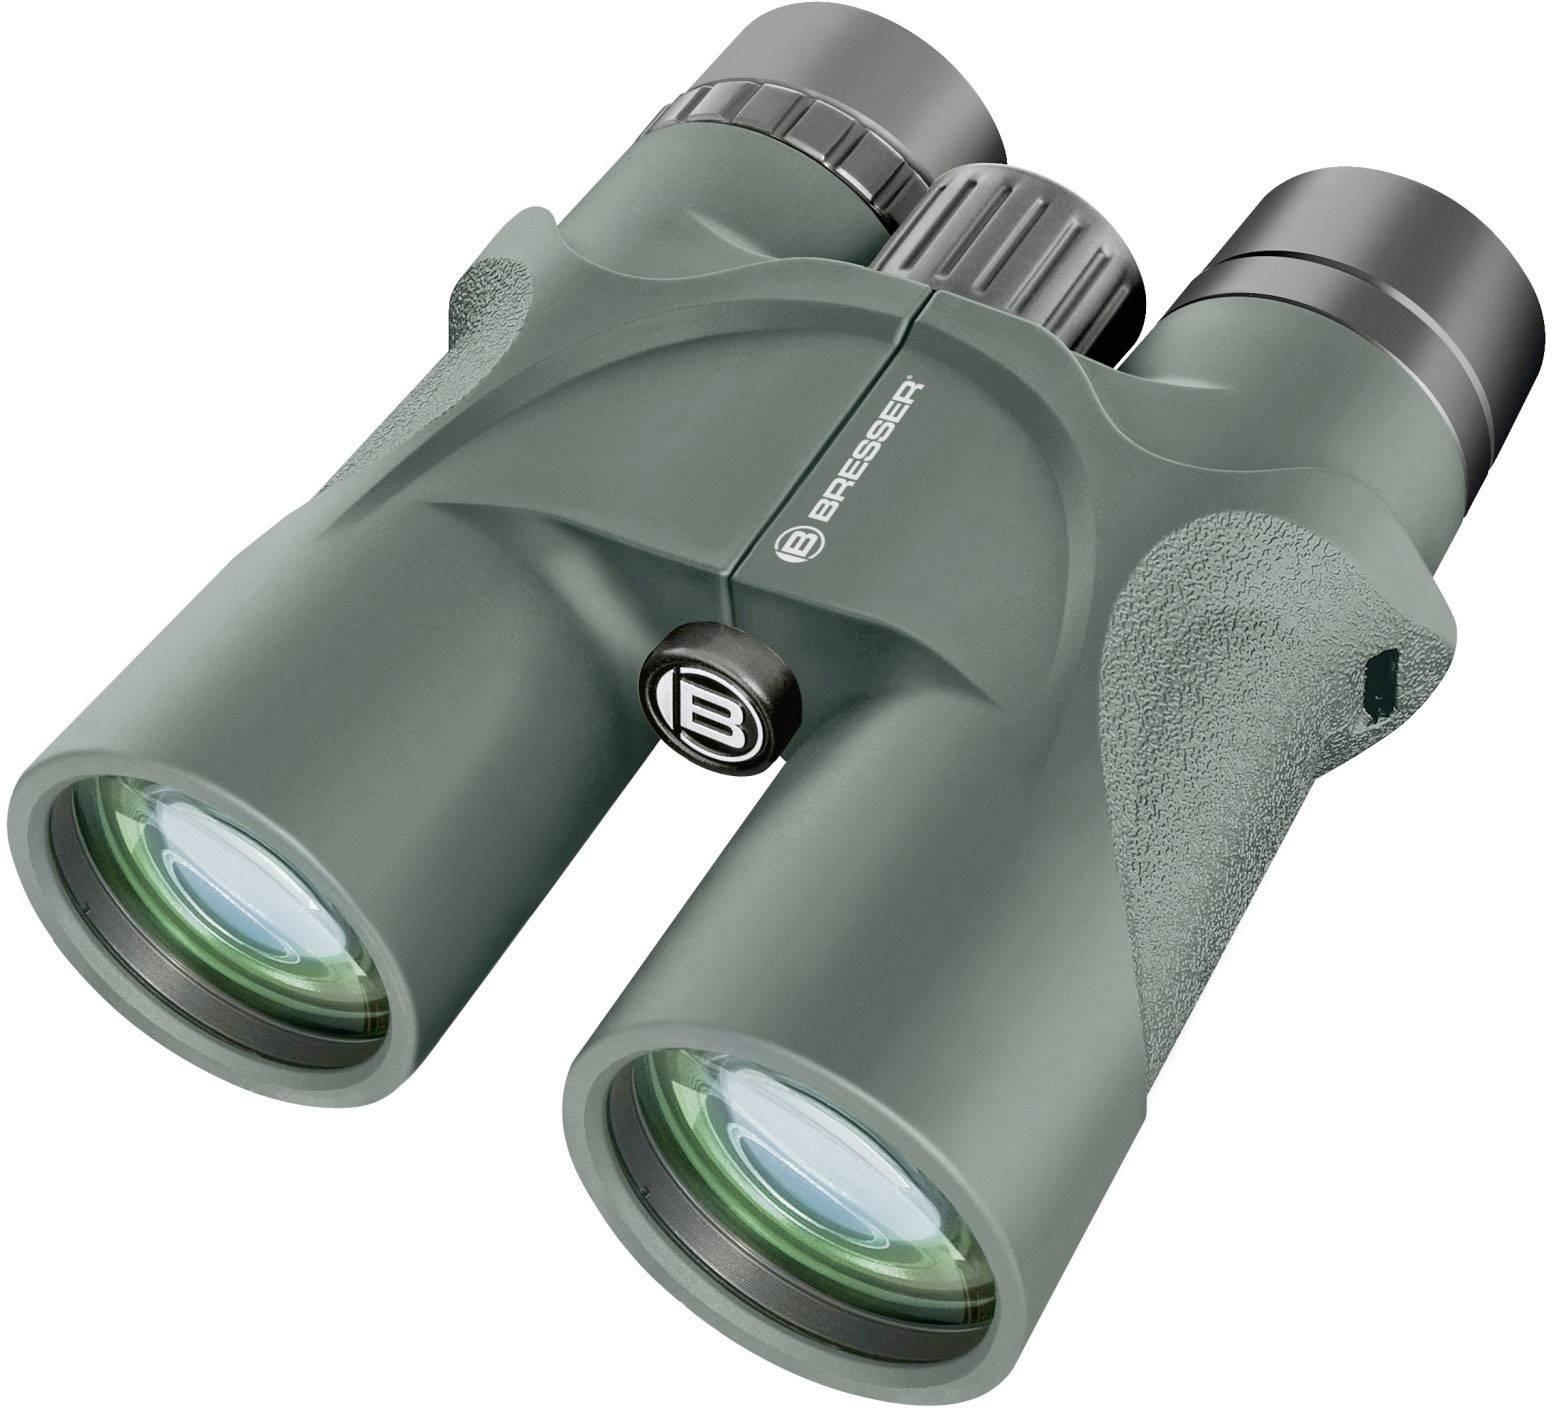 Ďalekohľad Bresser Optik Condor 1821042 42 mm, zelená lovecká